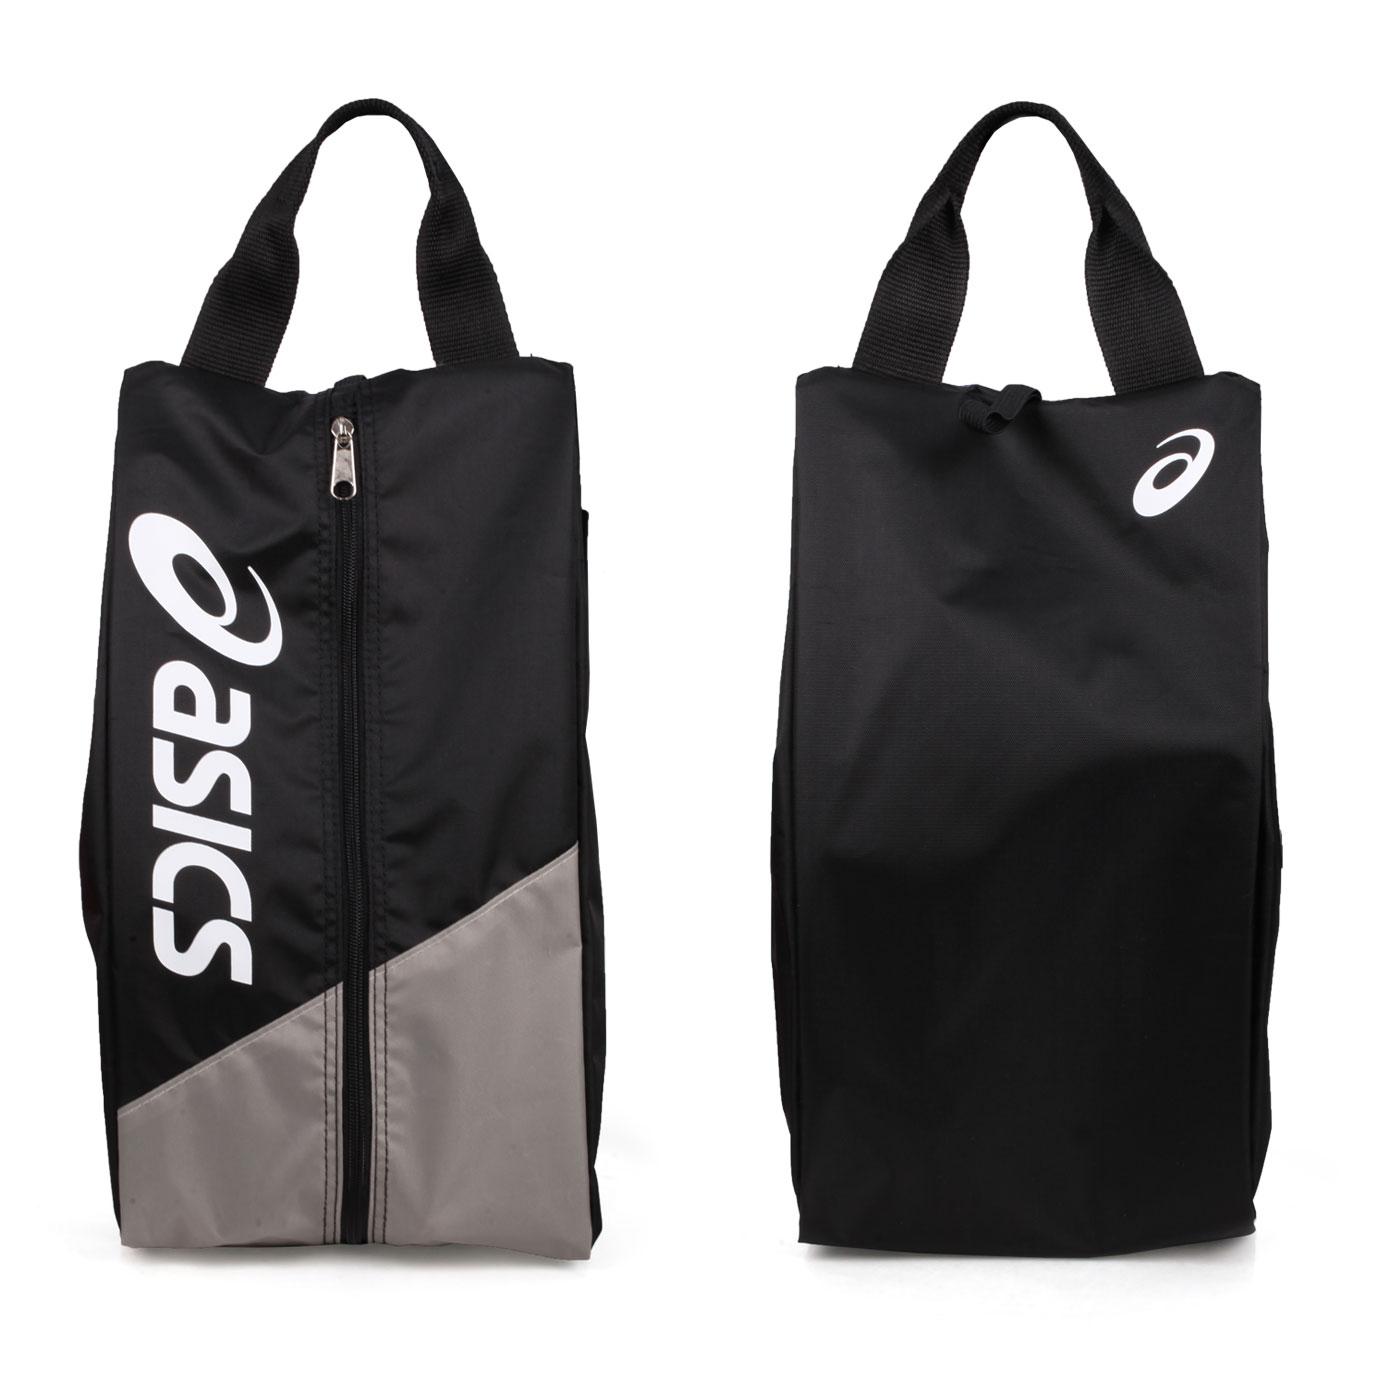 ASICS 鞋袋 Y12001-23 - 黑灰白